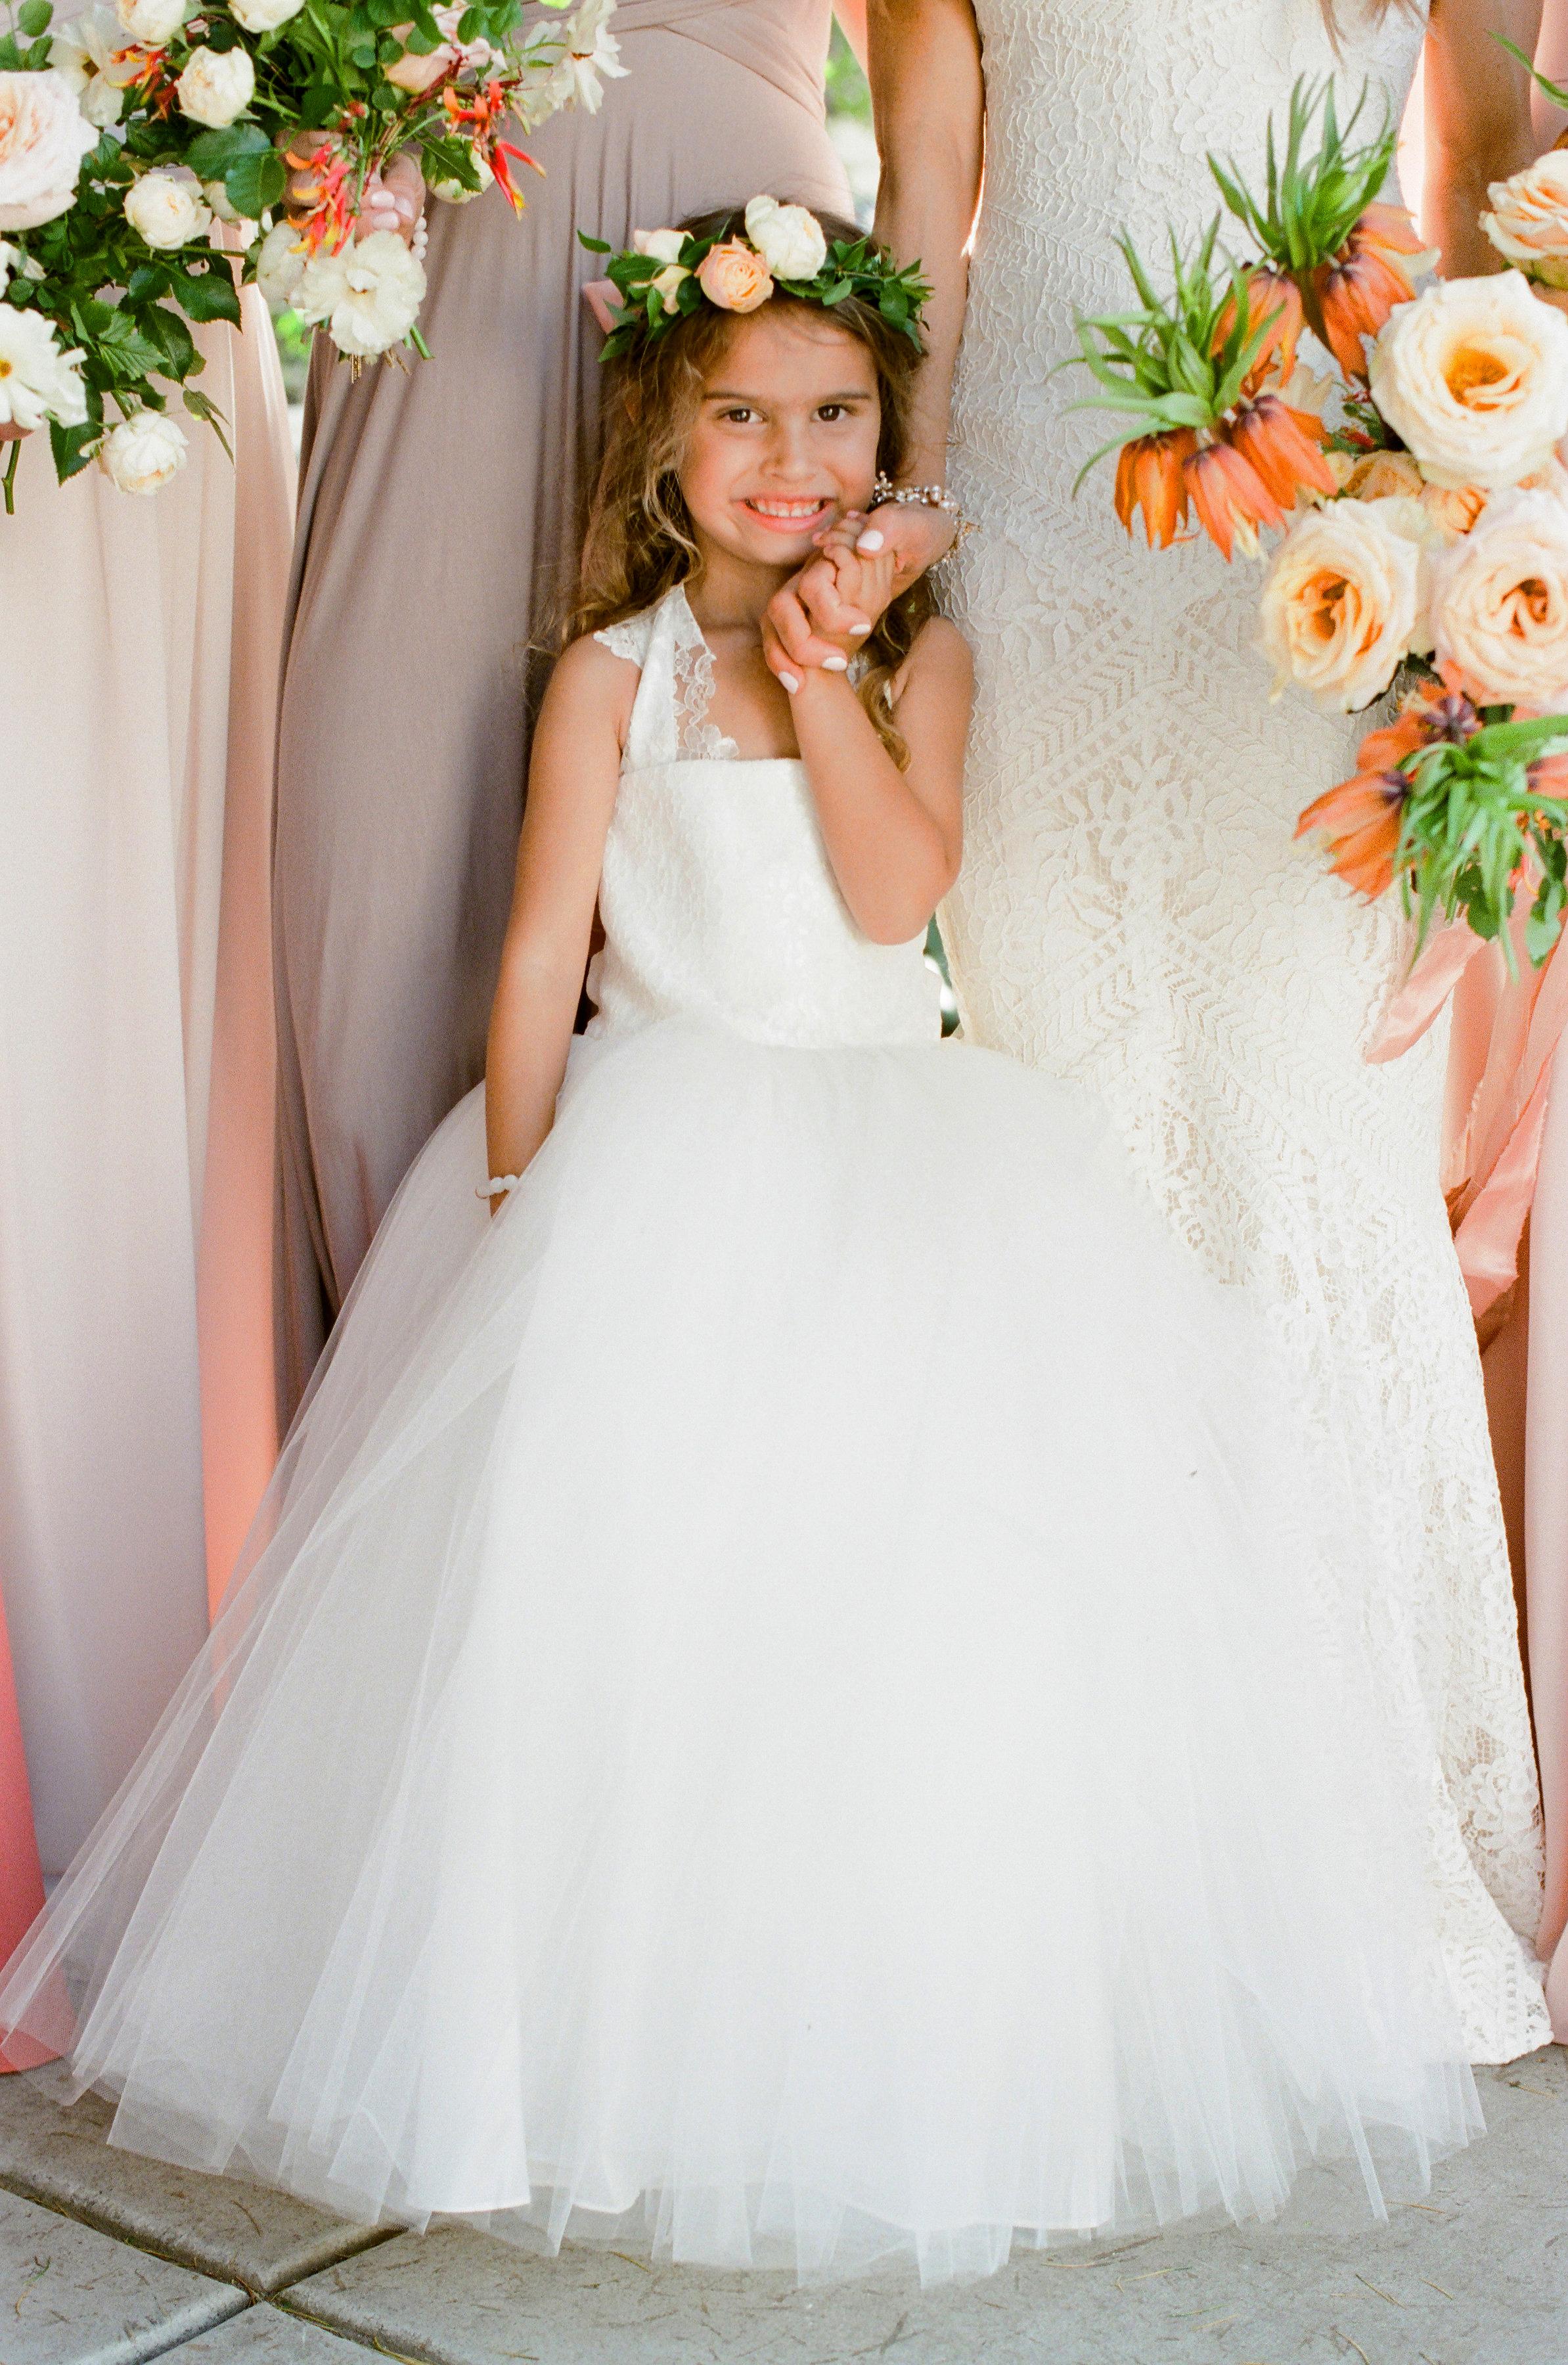 Tenley molzahn taylor leopold wedding flowergirl